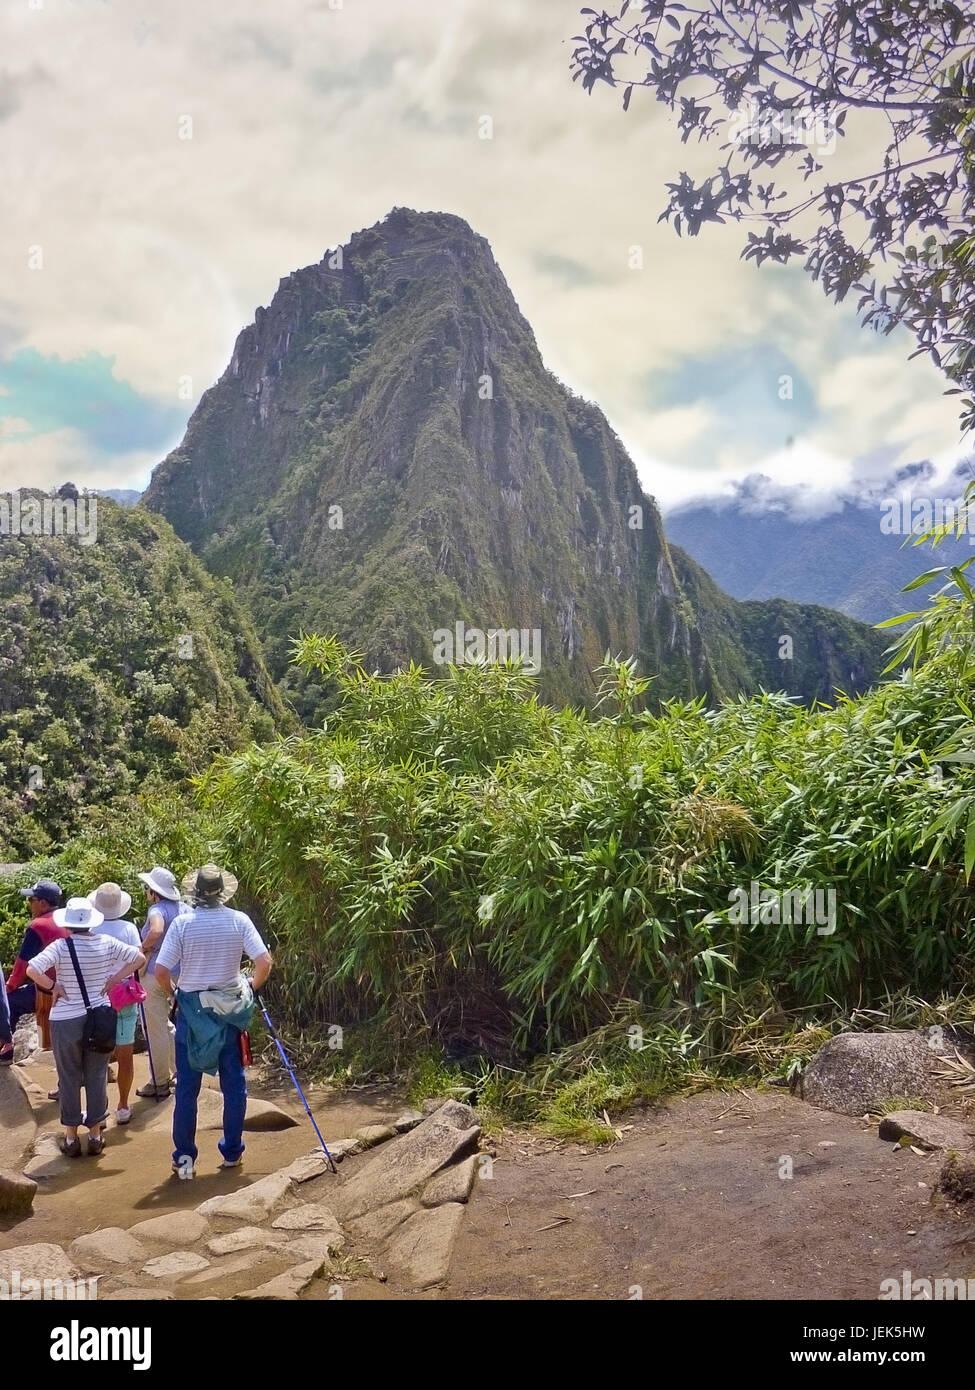 Huayna Picchu View from Machu Pichu Mountain - Stock Image